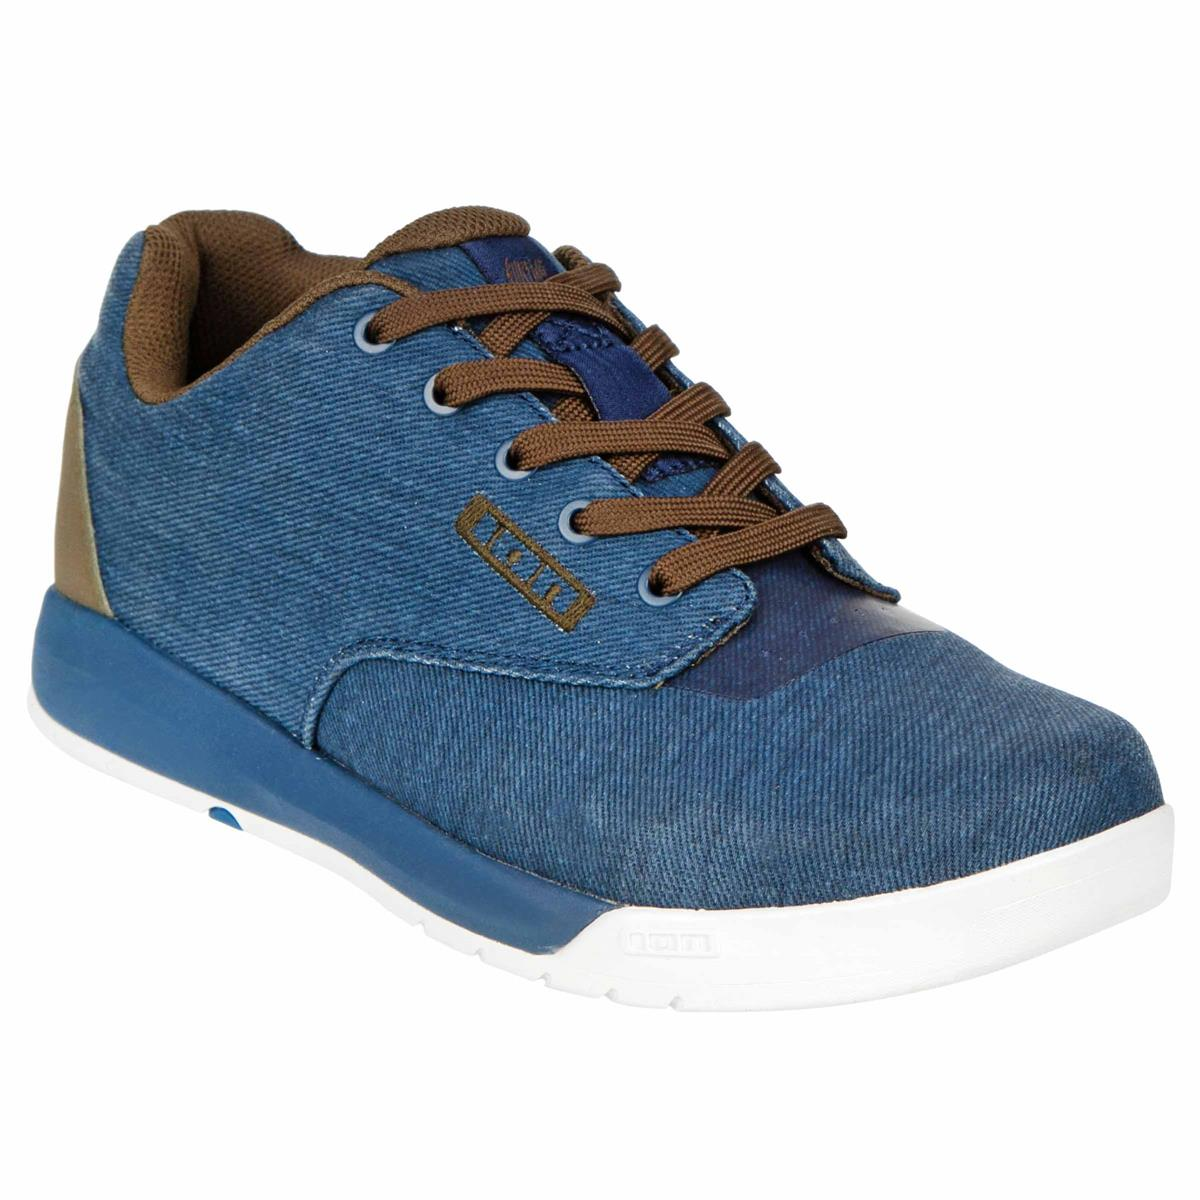 ION MTB Schuhe Raid II Ocean Blau